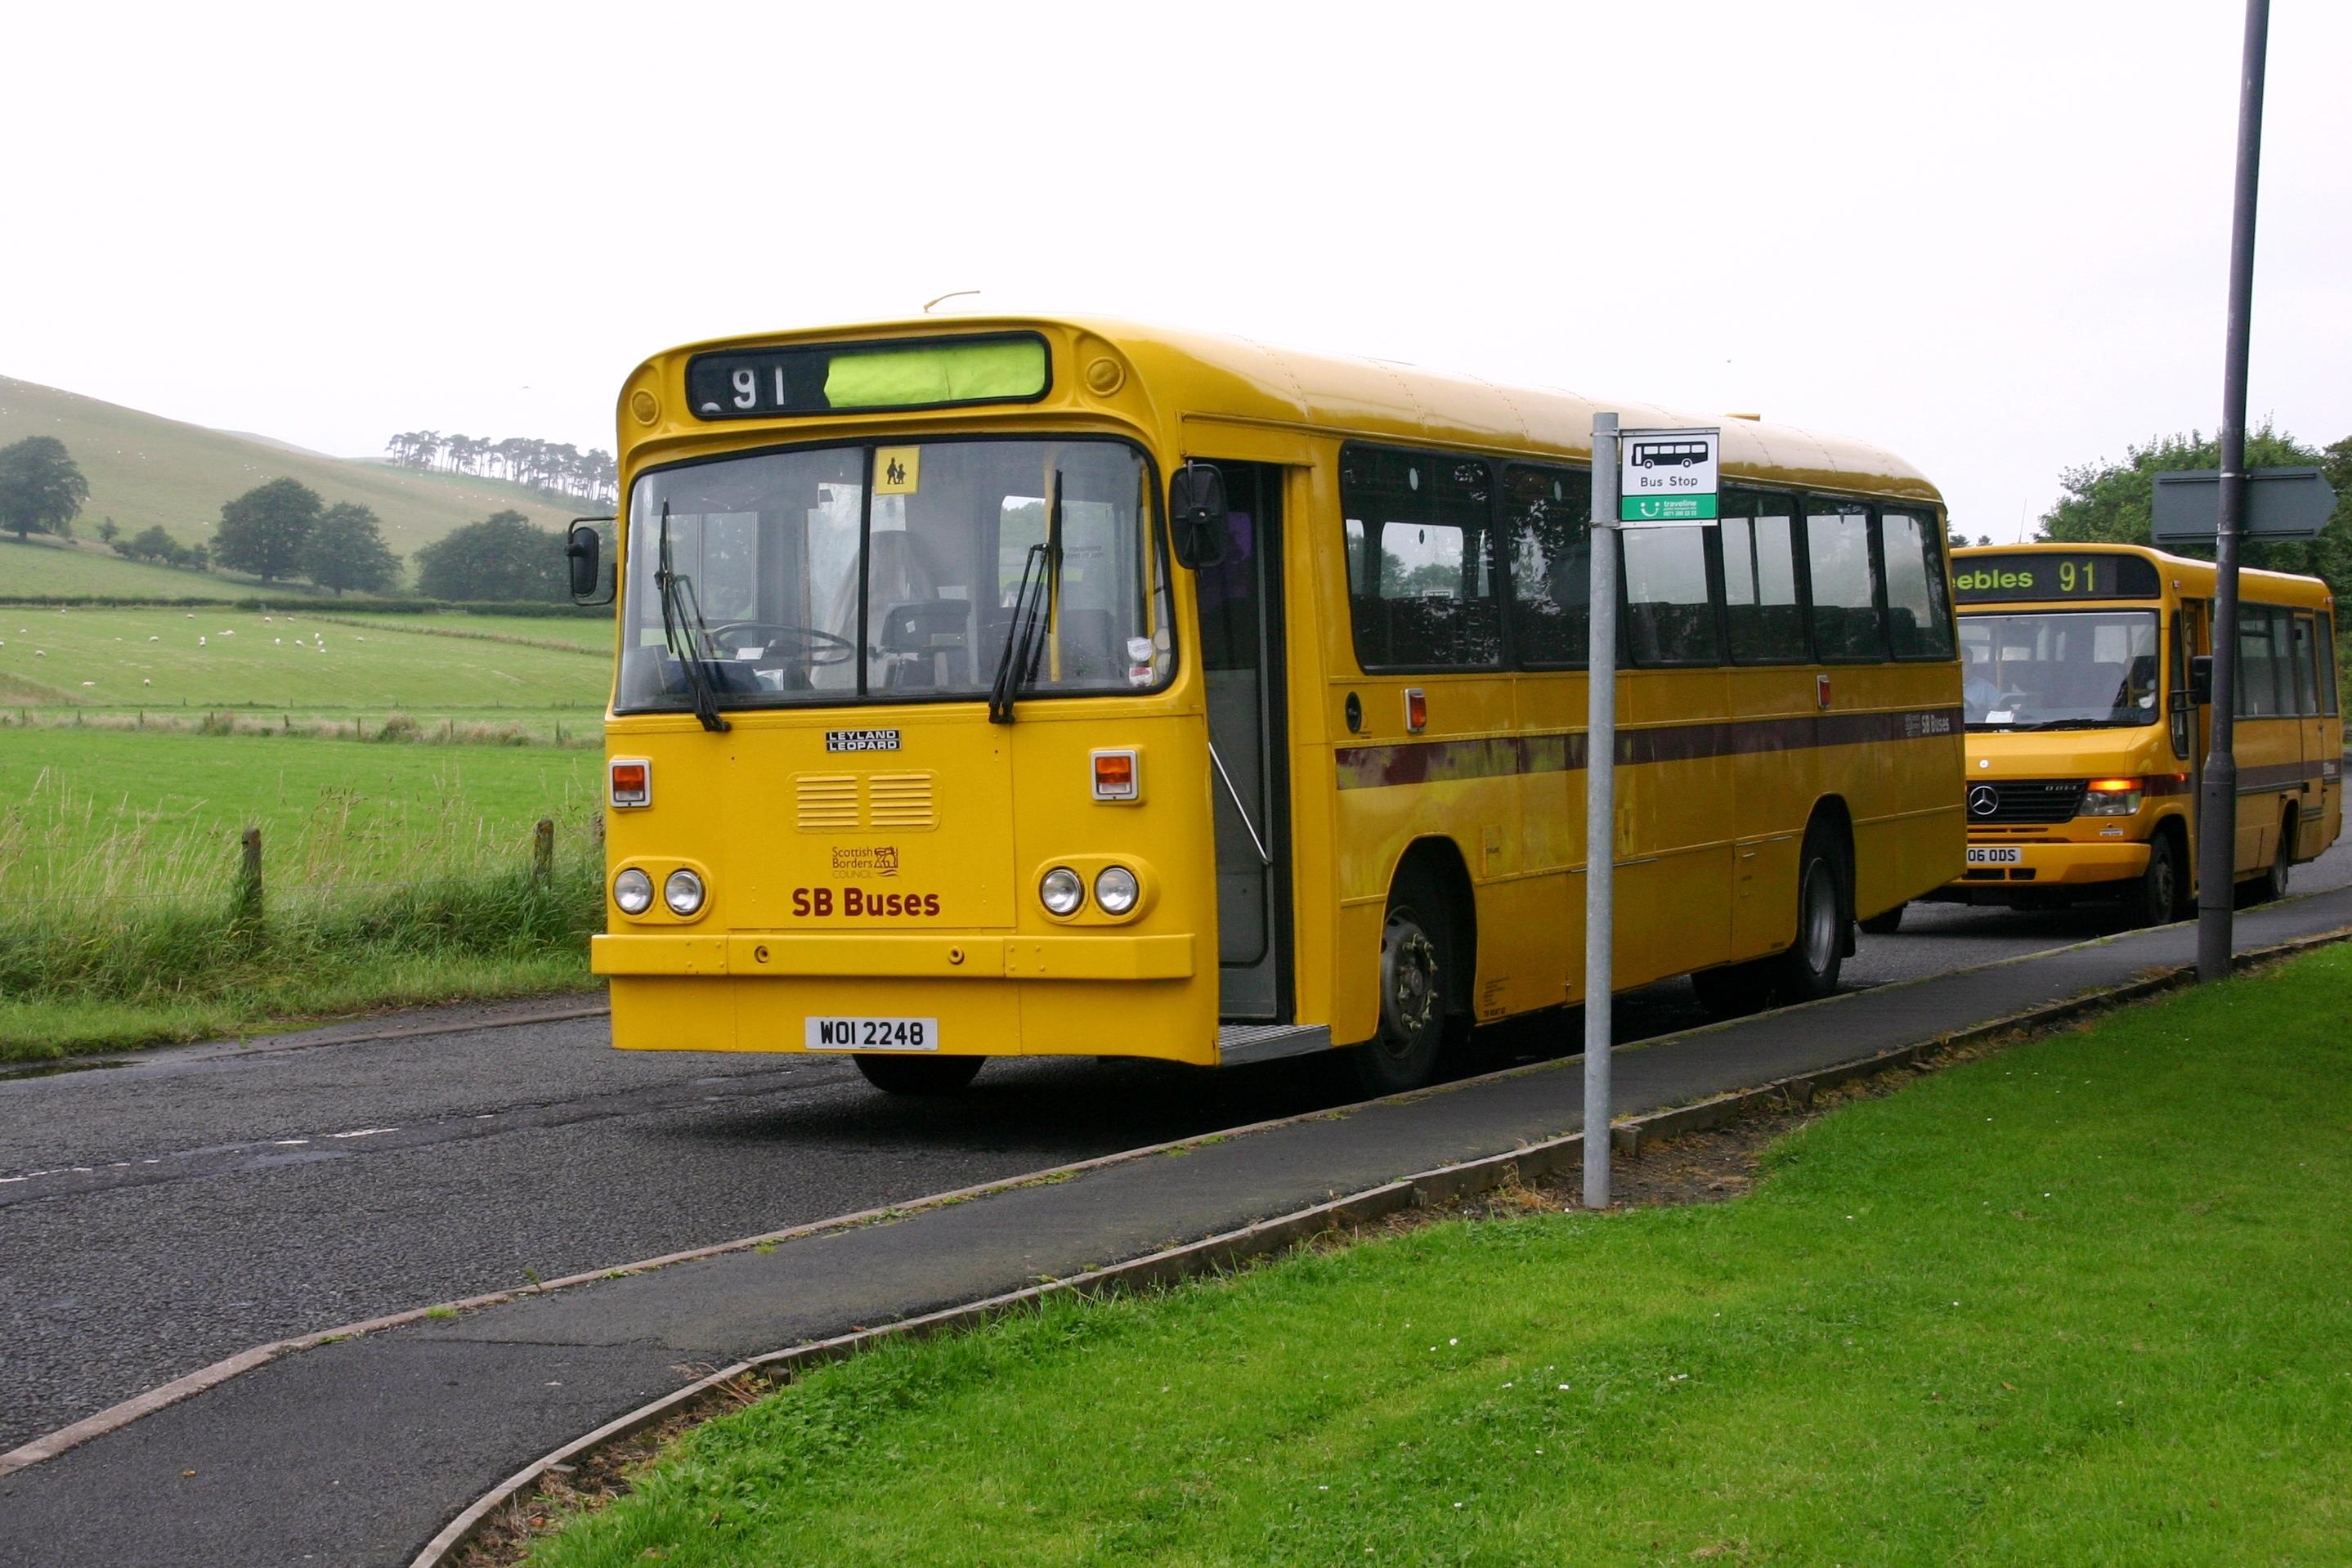 File:SB Buses Leyland Leopard WOI 2248.JPG